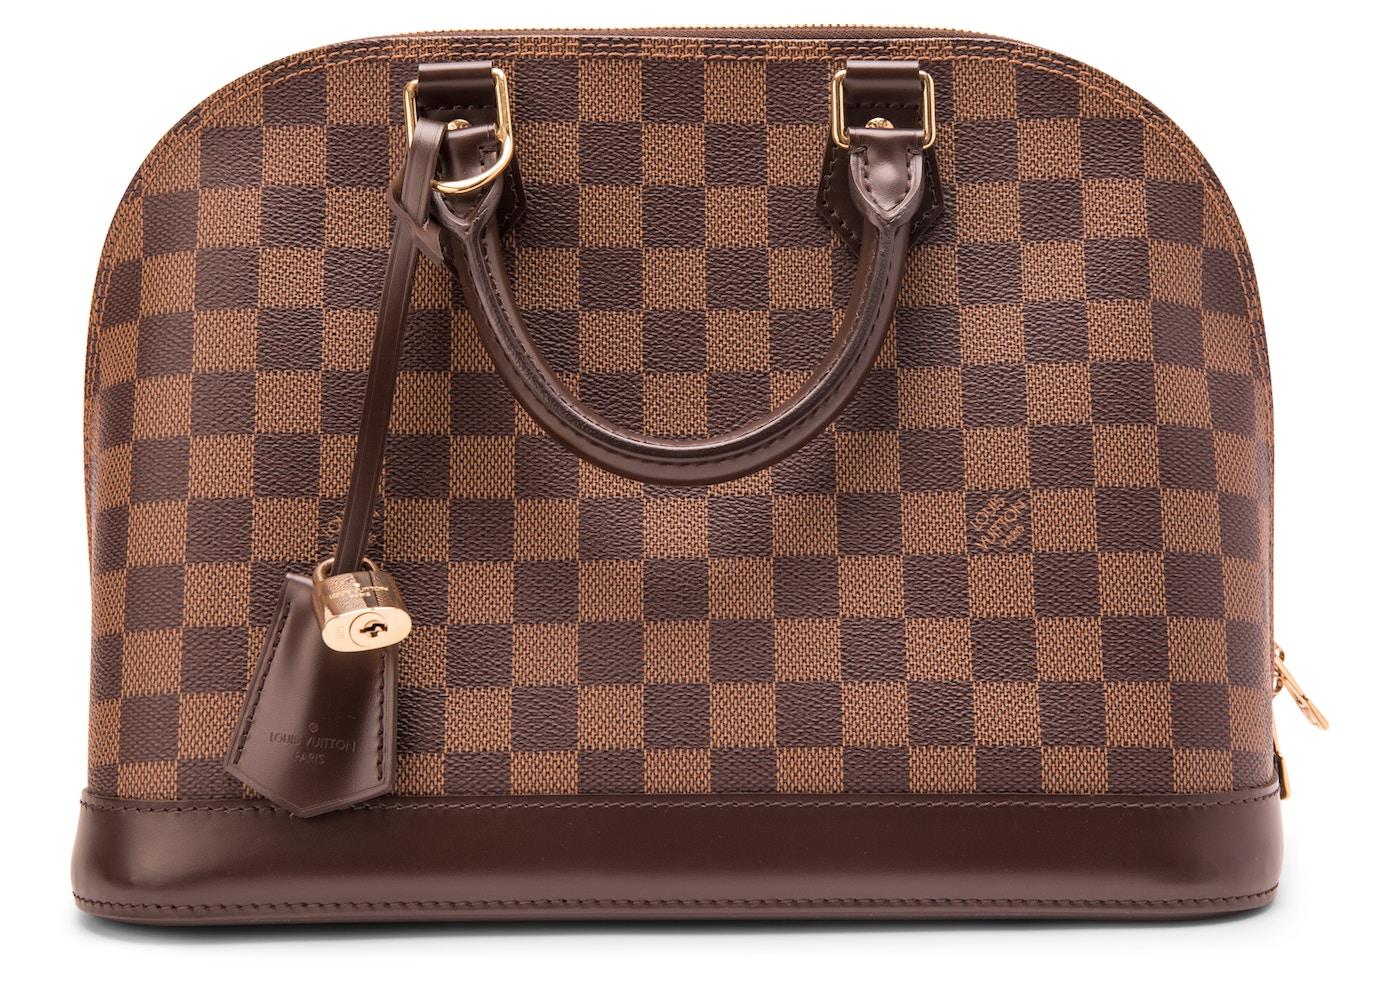 e83d0df6d4f4 Louis Vuitton Alma Damier Ebene PM Brown. Damier Ebene PM Brown